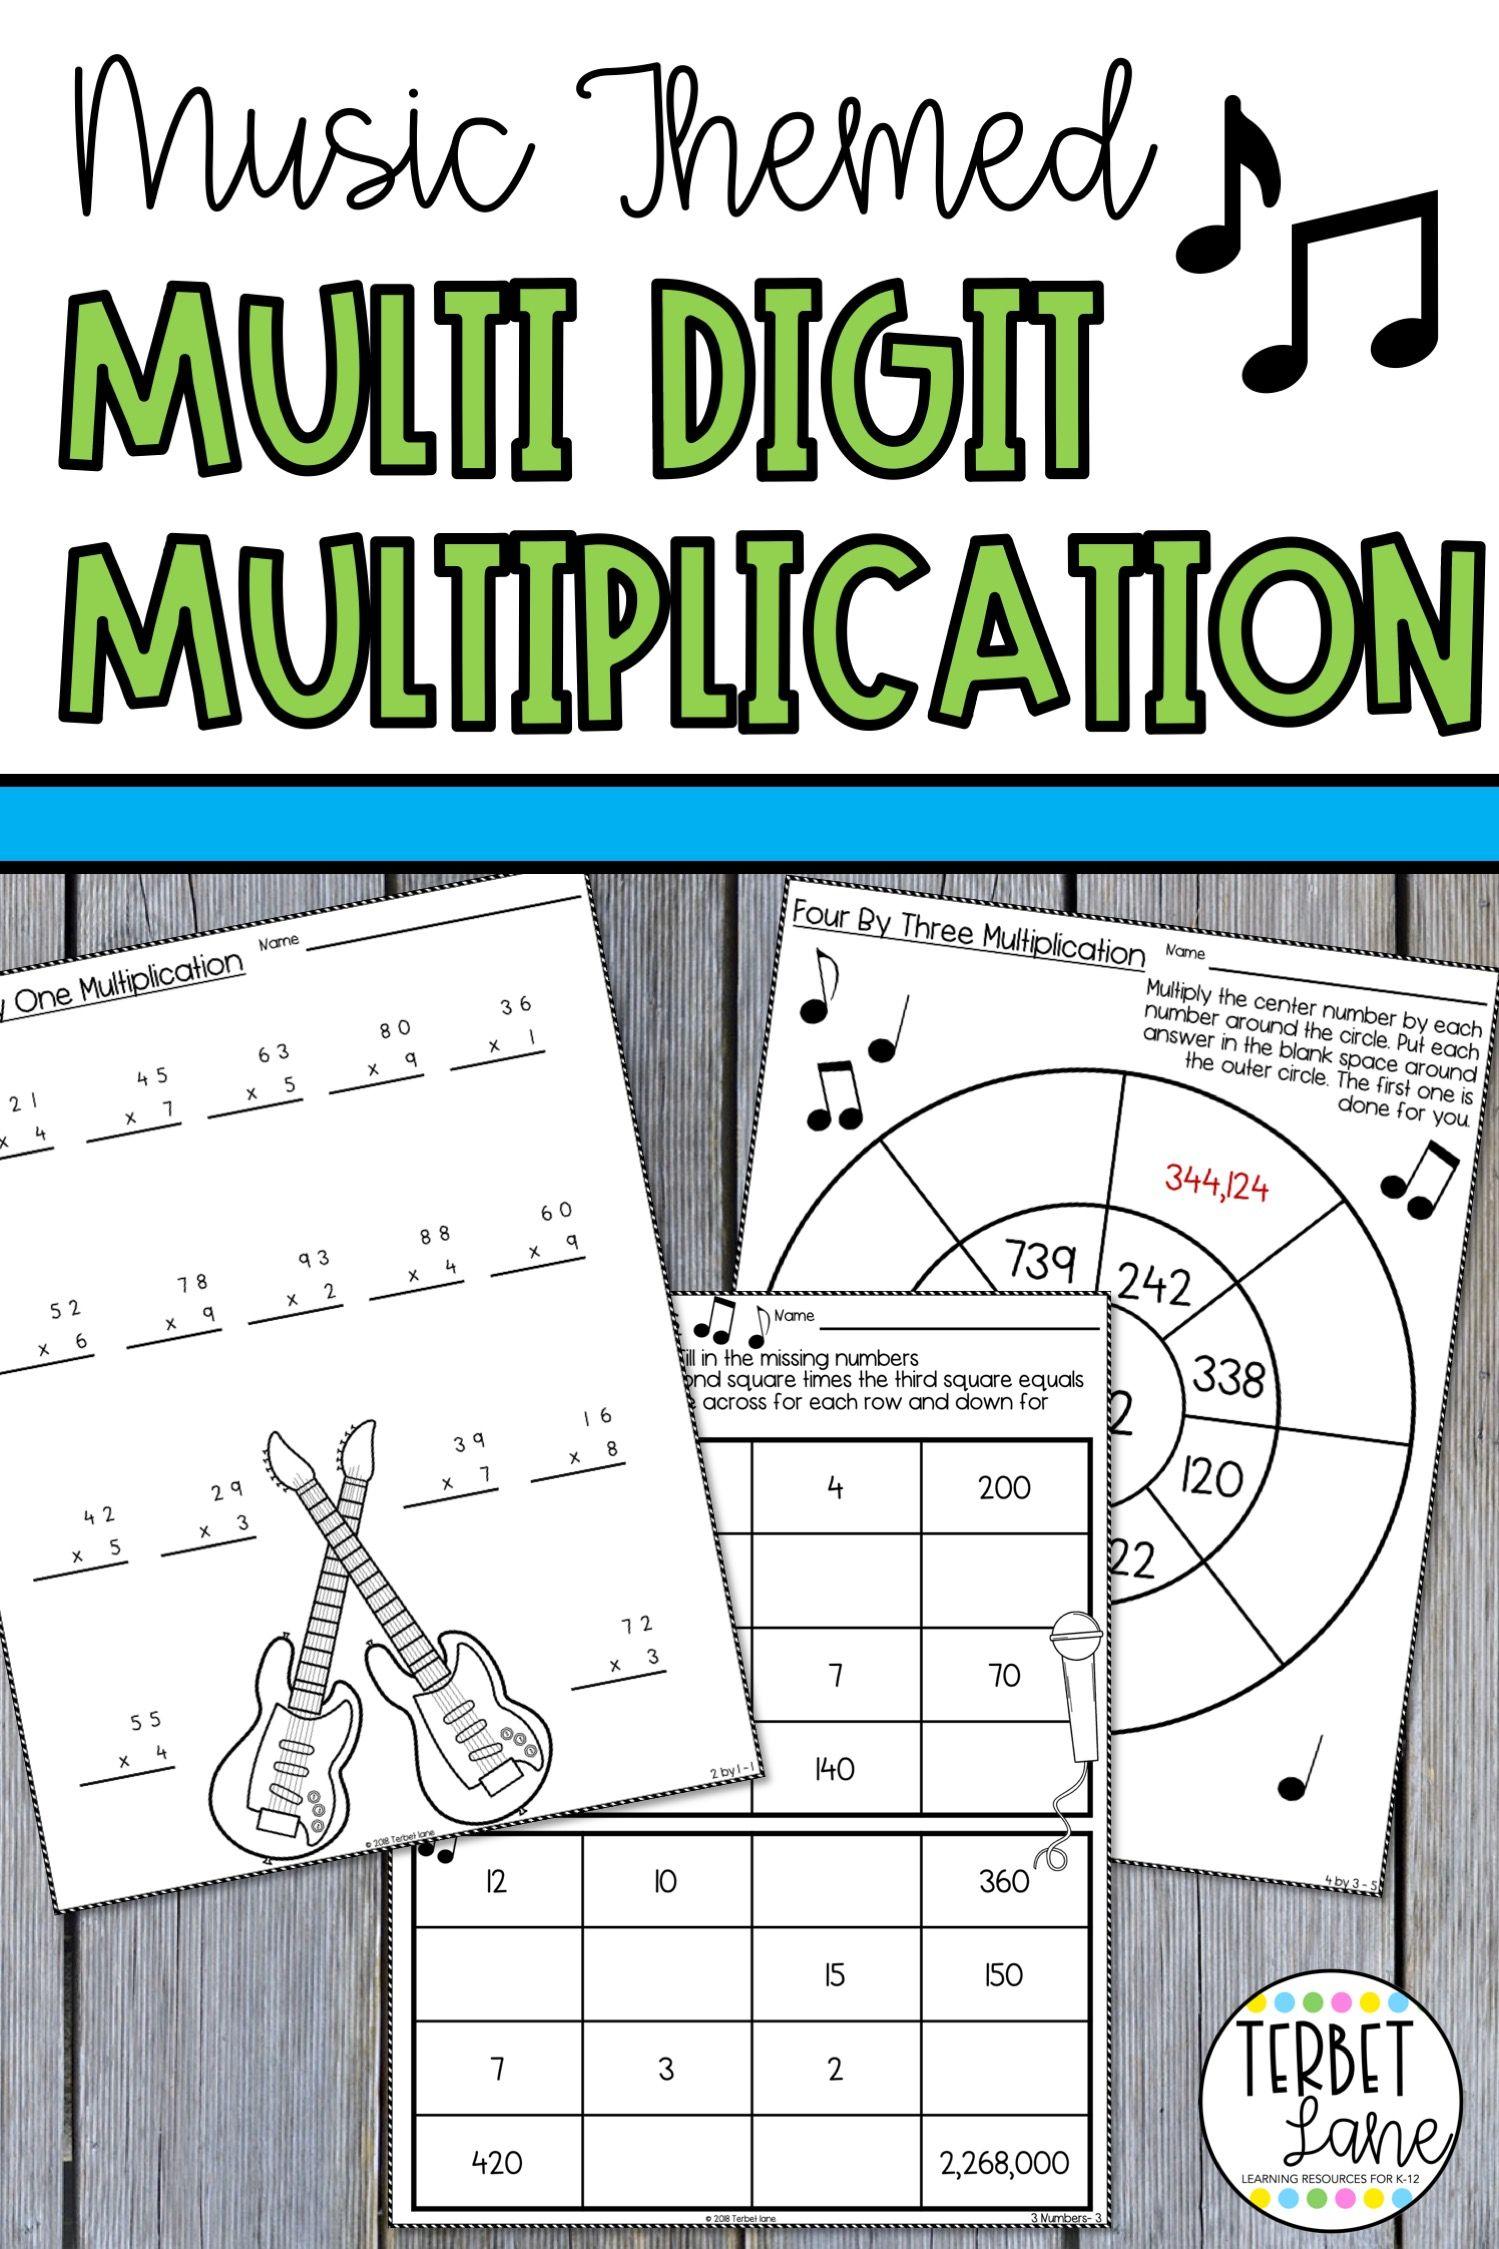 Multi Digit Multiplication Worksheet